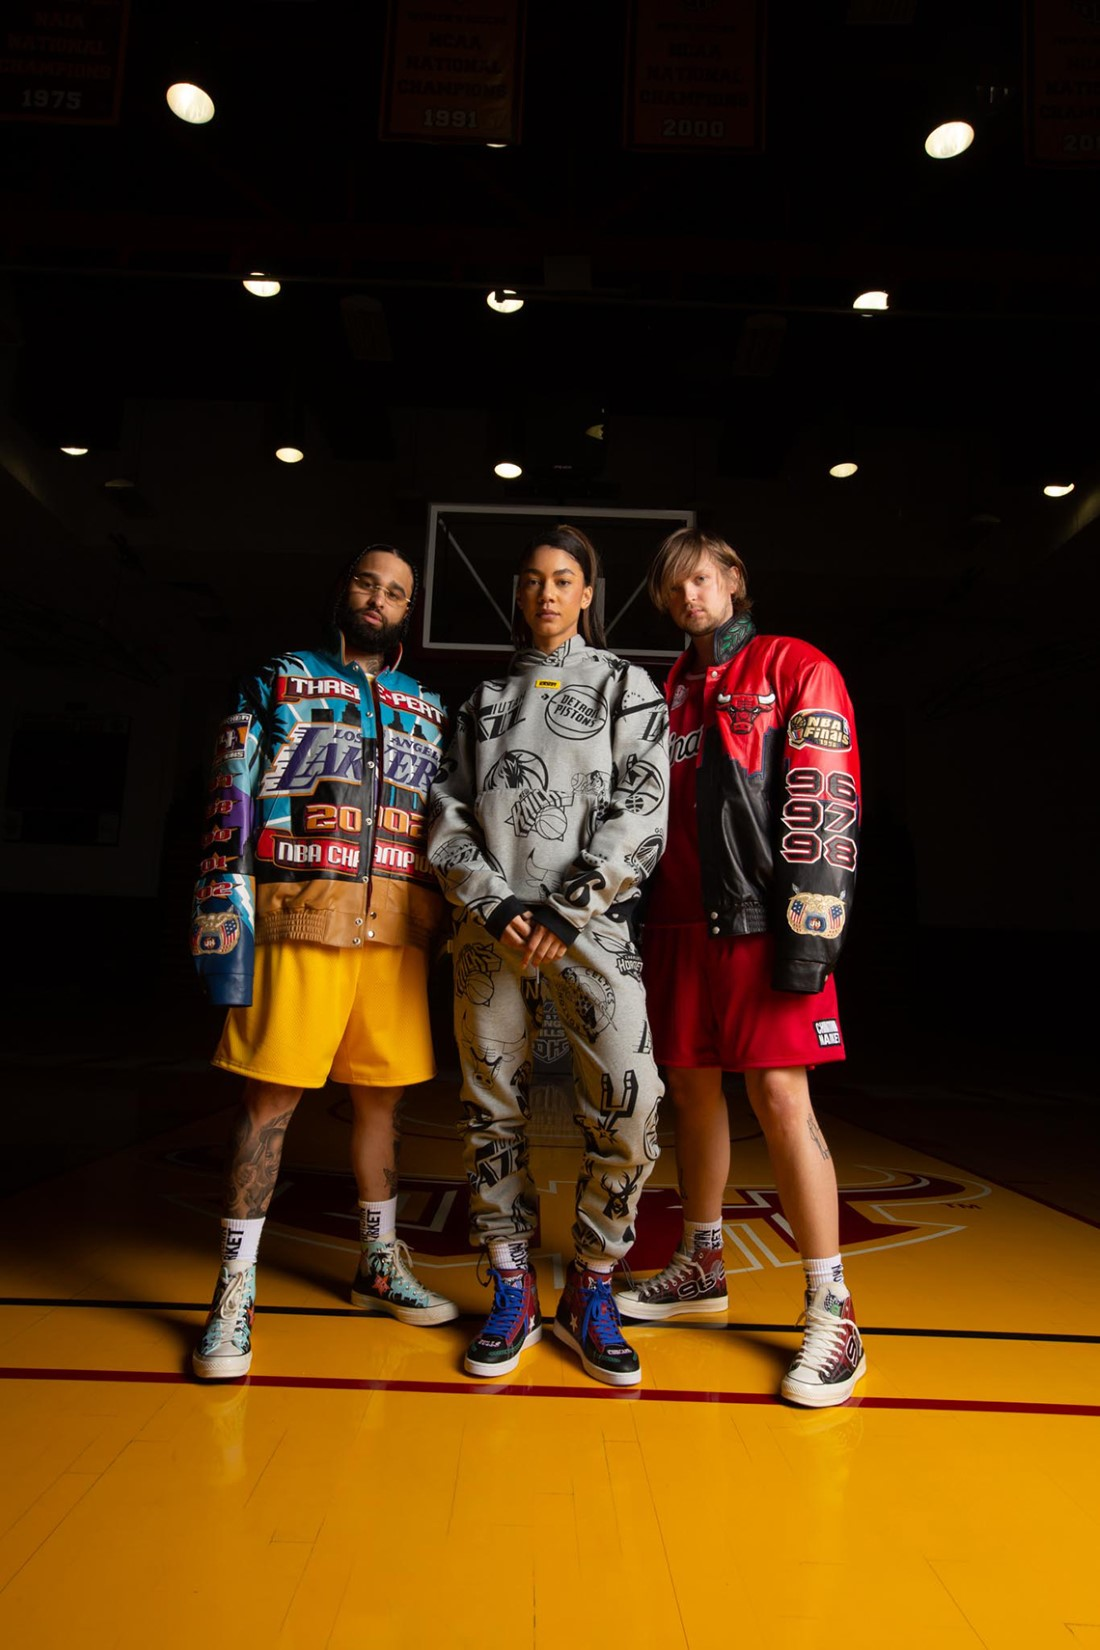 Converse x Chinatown Market x NBA